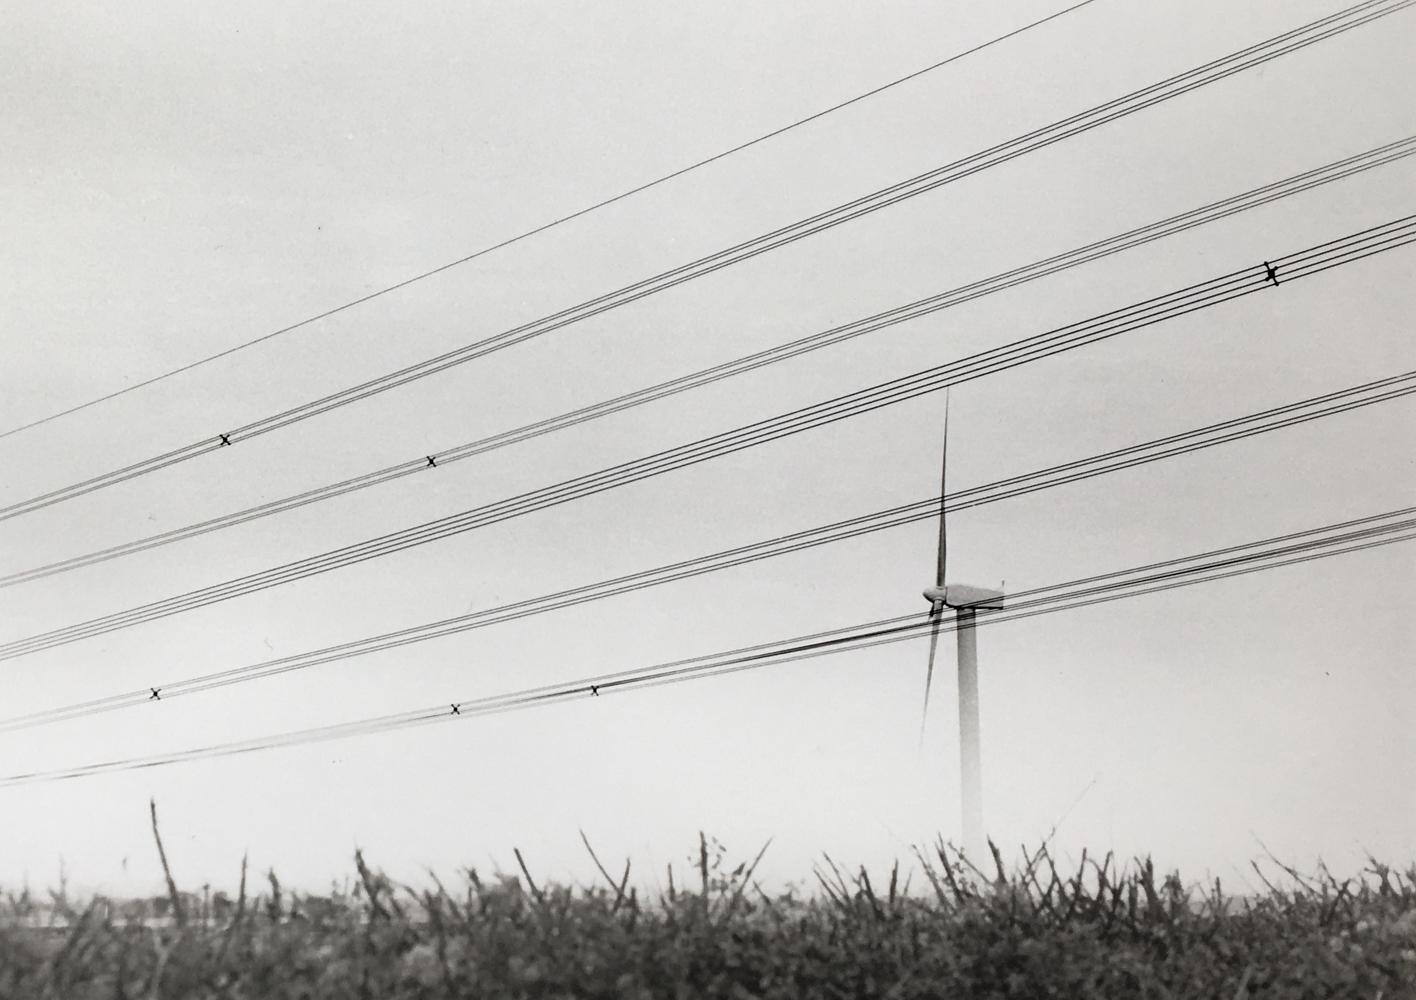 B&W-landscape-environment-human-impact-photography-bath-england-fog-foggy-perspective-wind-turbine-natalia-smith-photography-0007.jpg